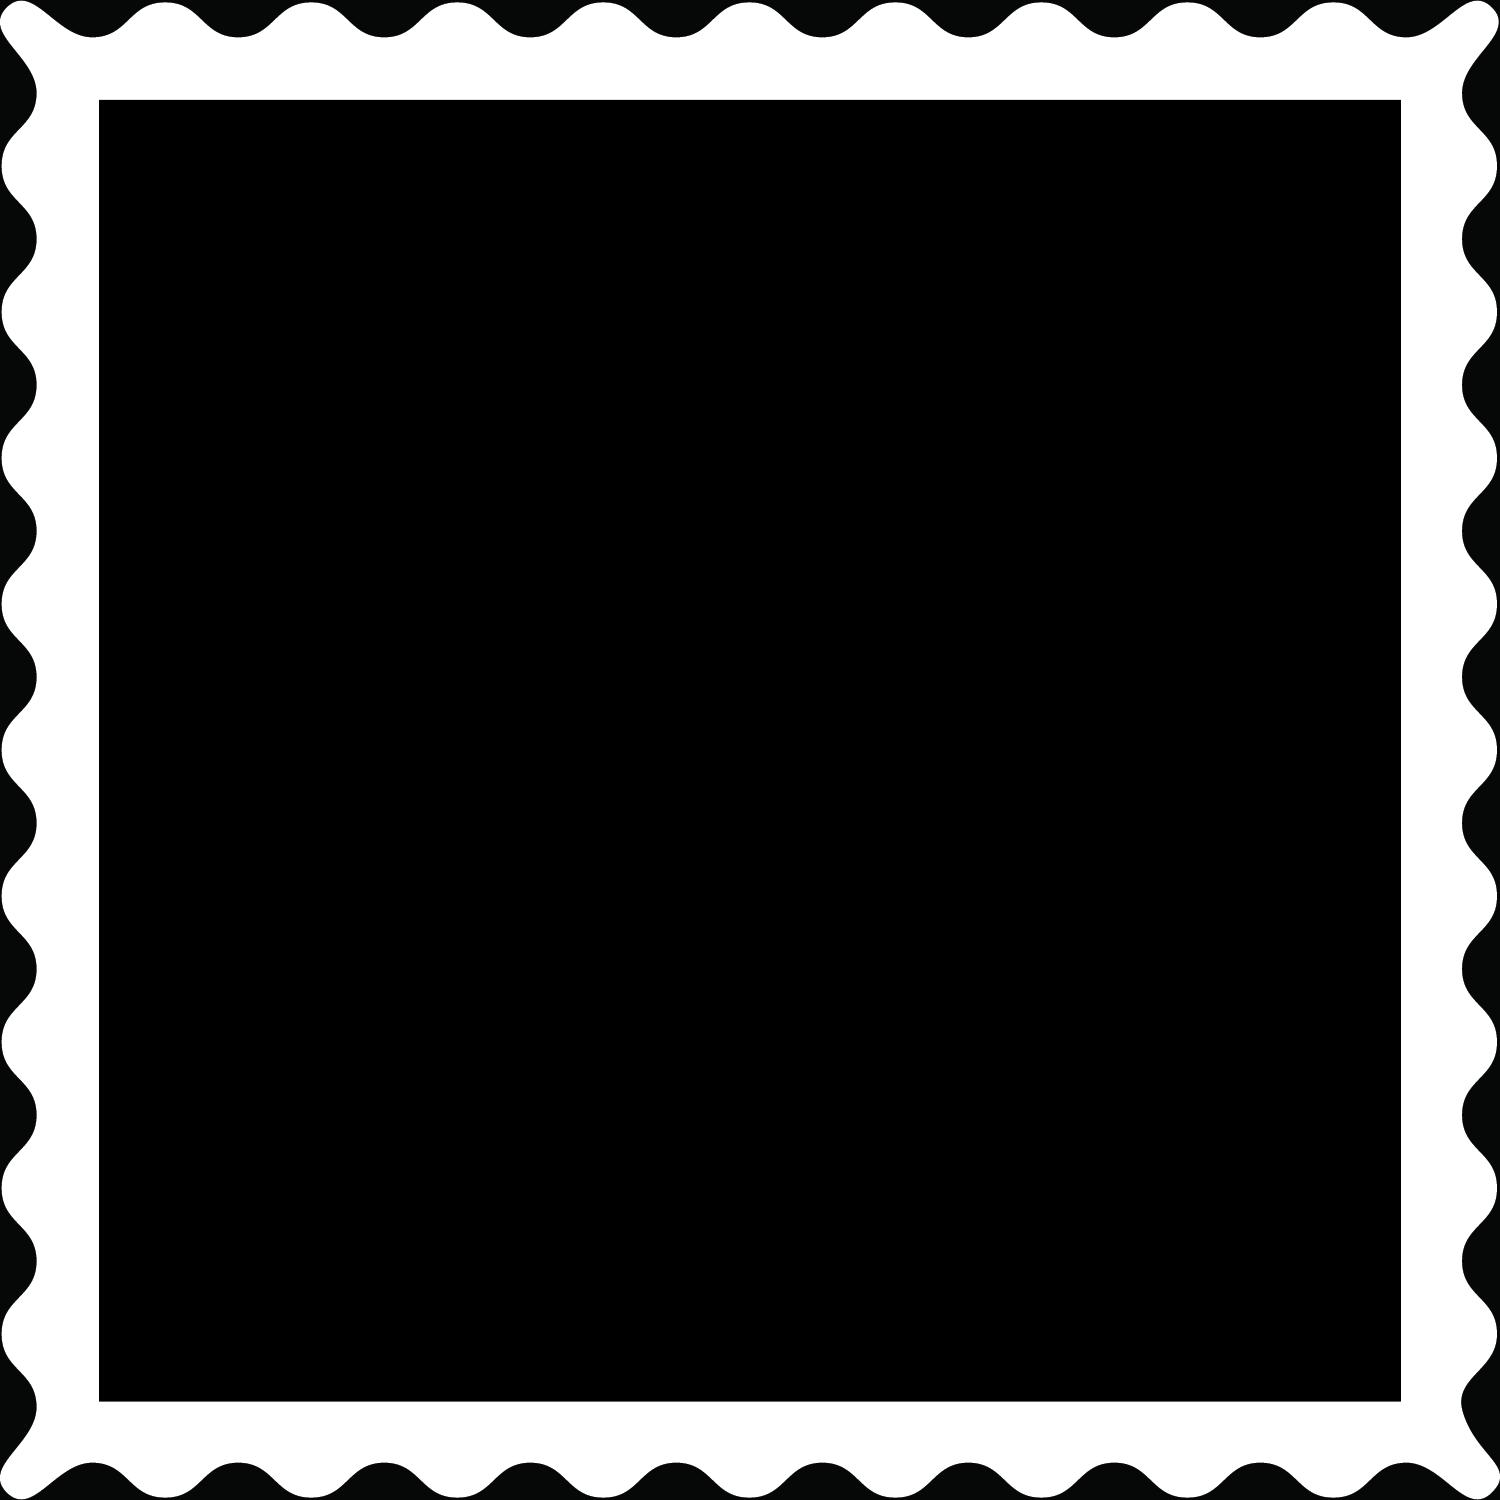 transparent black border - HD1500×1500